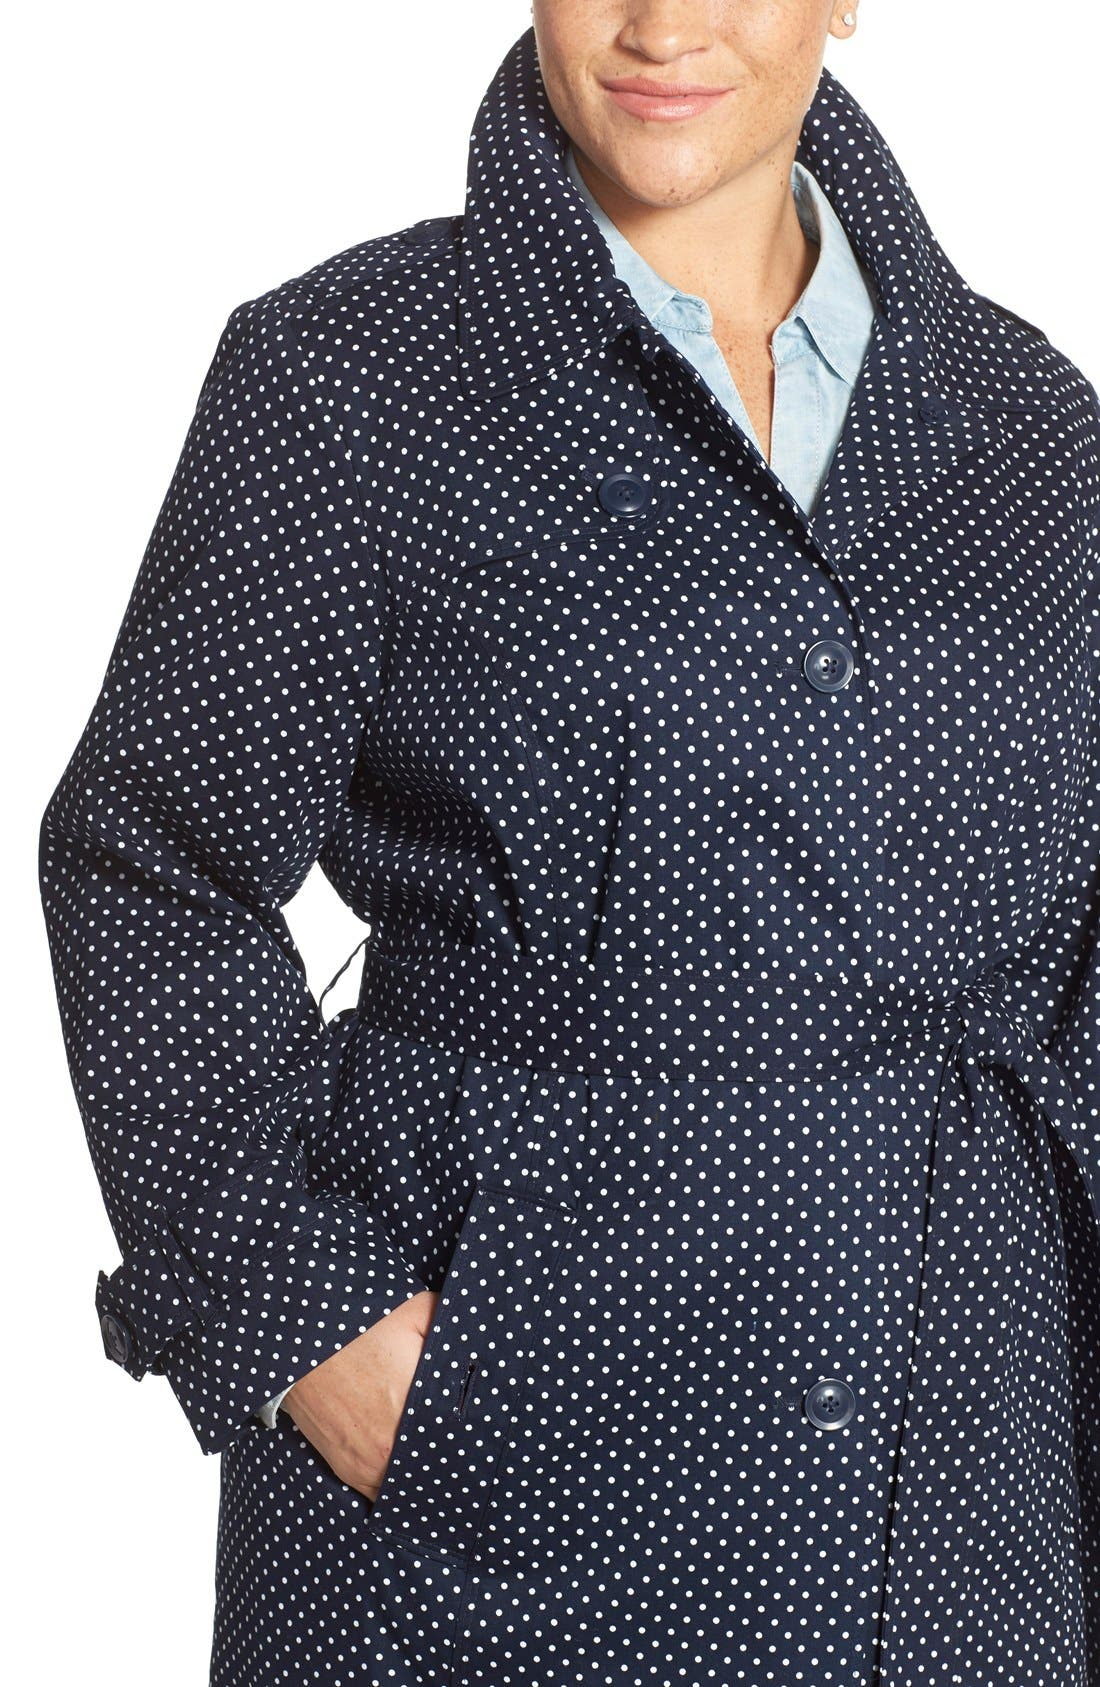 Polka Dot Single Breasted Trench Coat,                             Alternate thumbnail 12, color,                             410